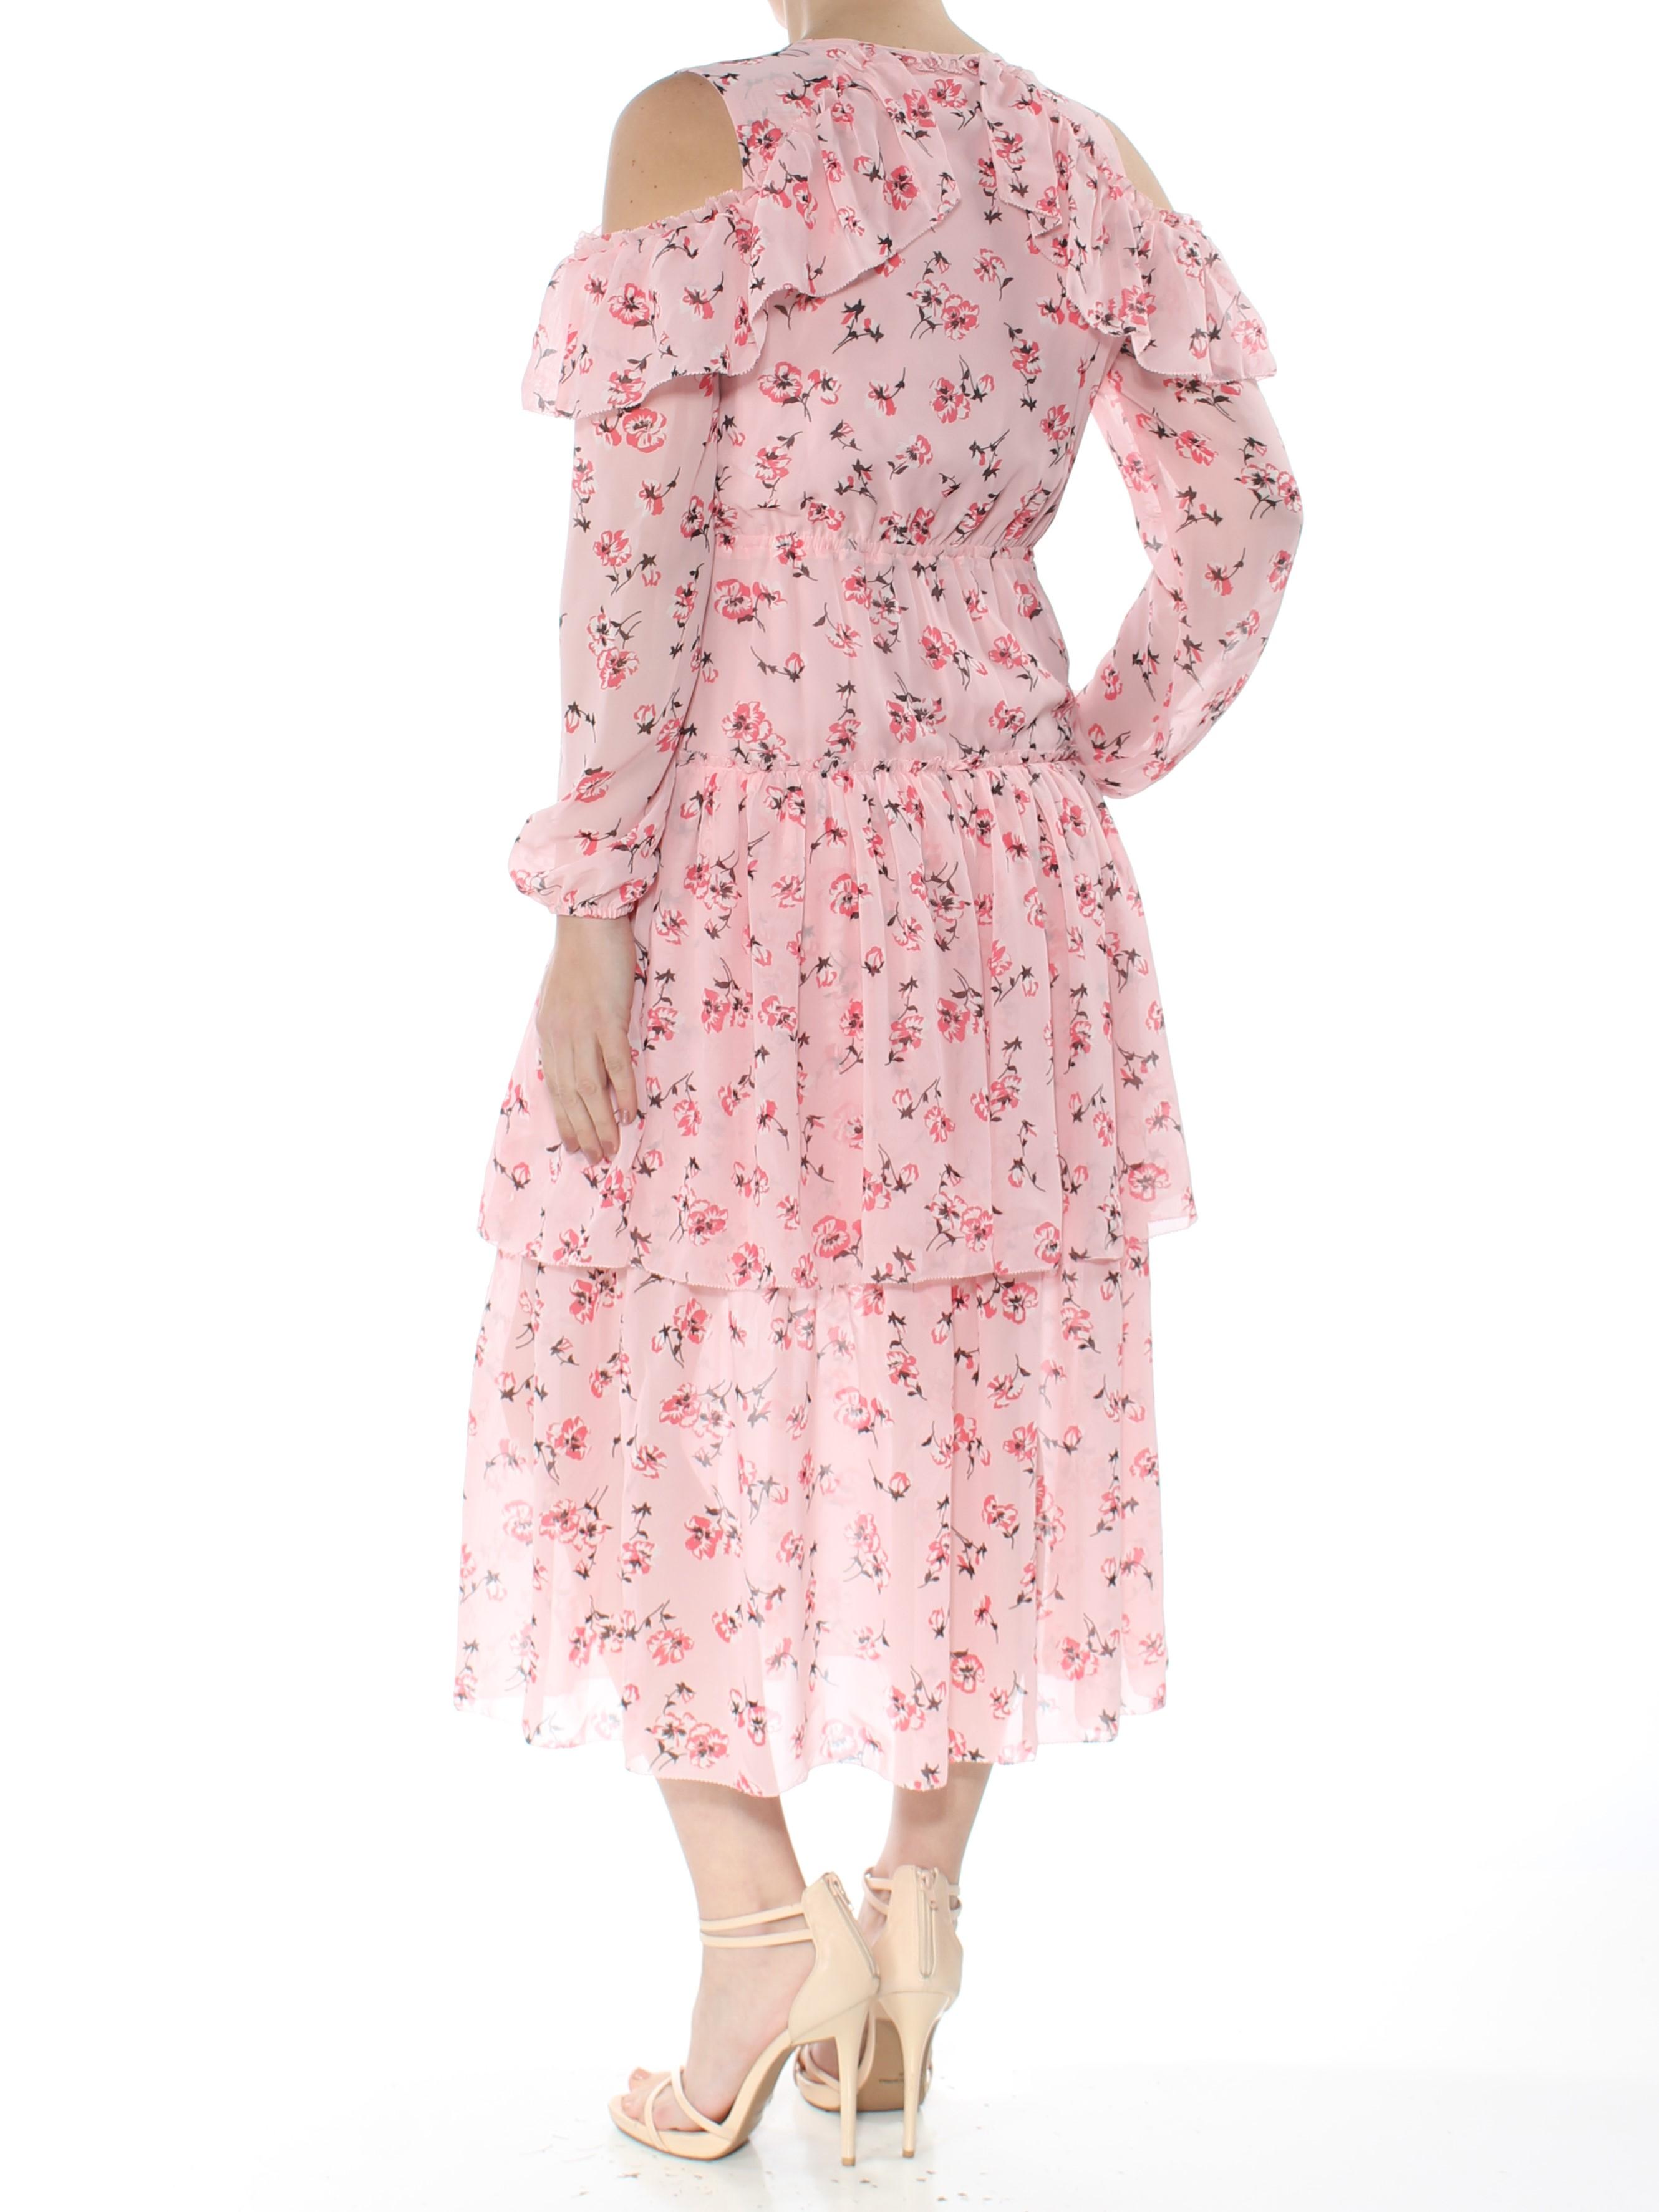 568e7b34b3 MAISON JULES  99 Womens New 1287 Pink Floral Print Cold Shoulder ...